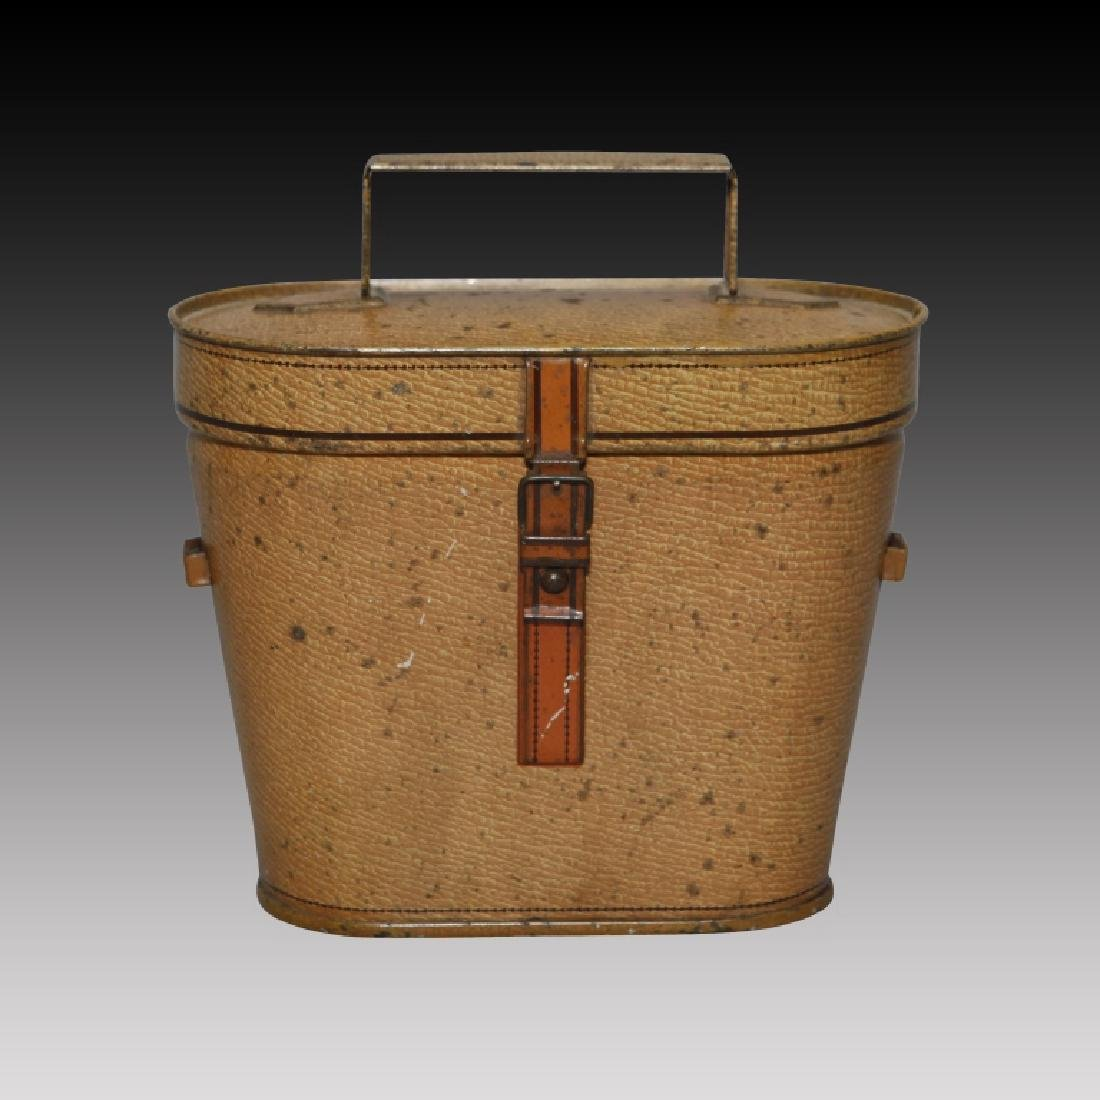 Huntley & Palmers Biscuit Tin Binoculars